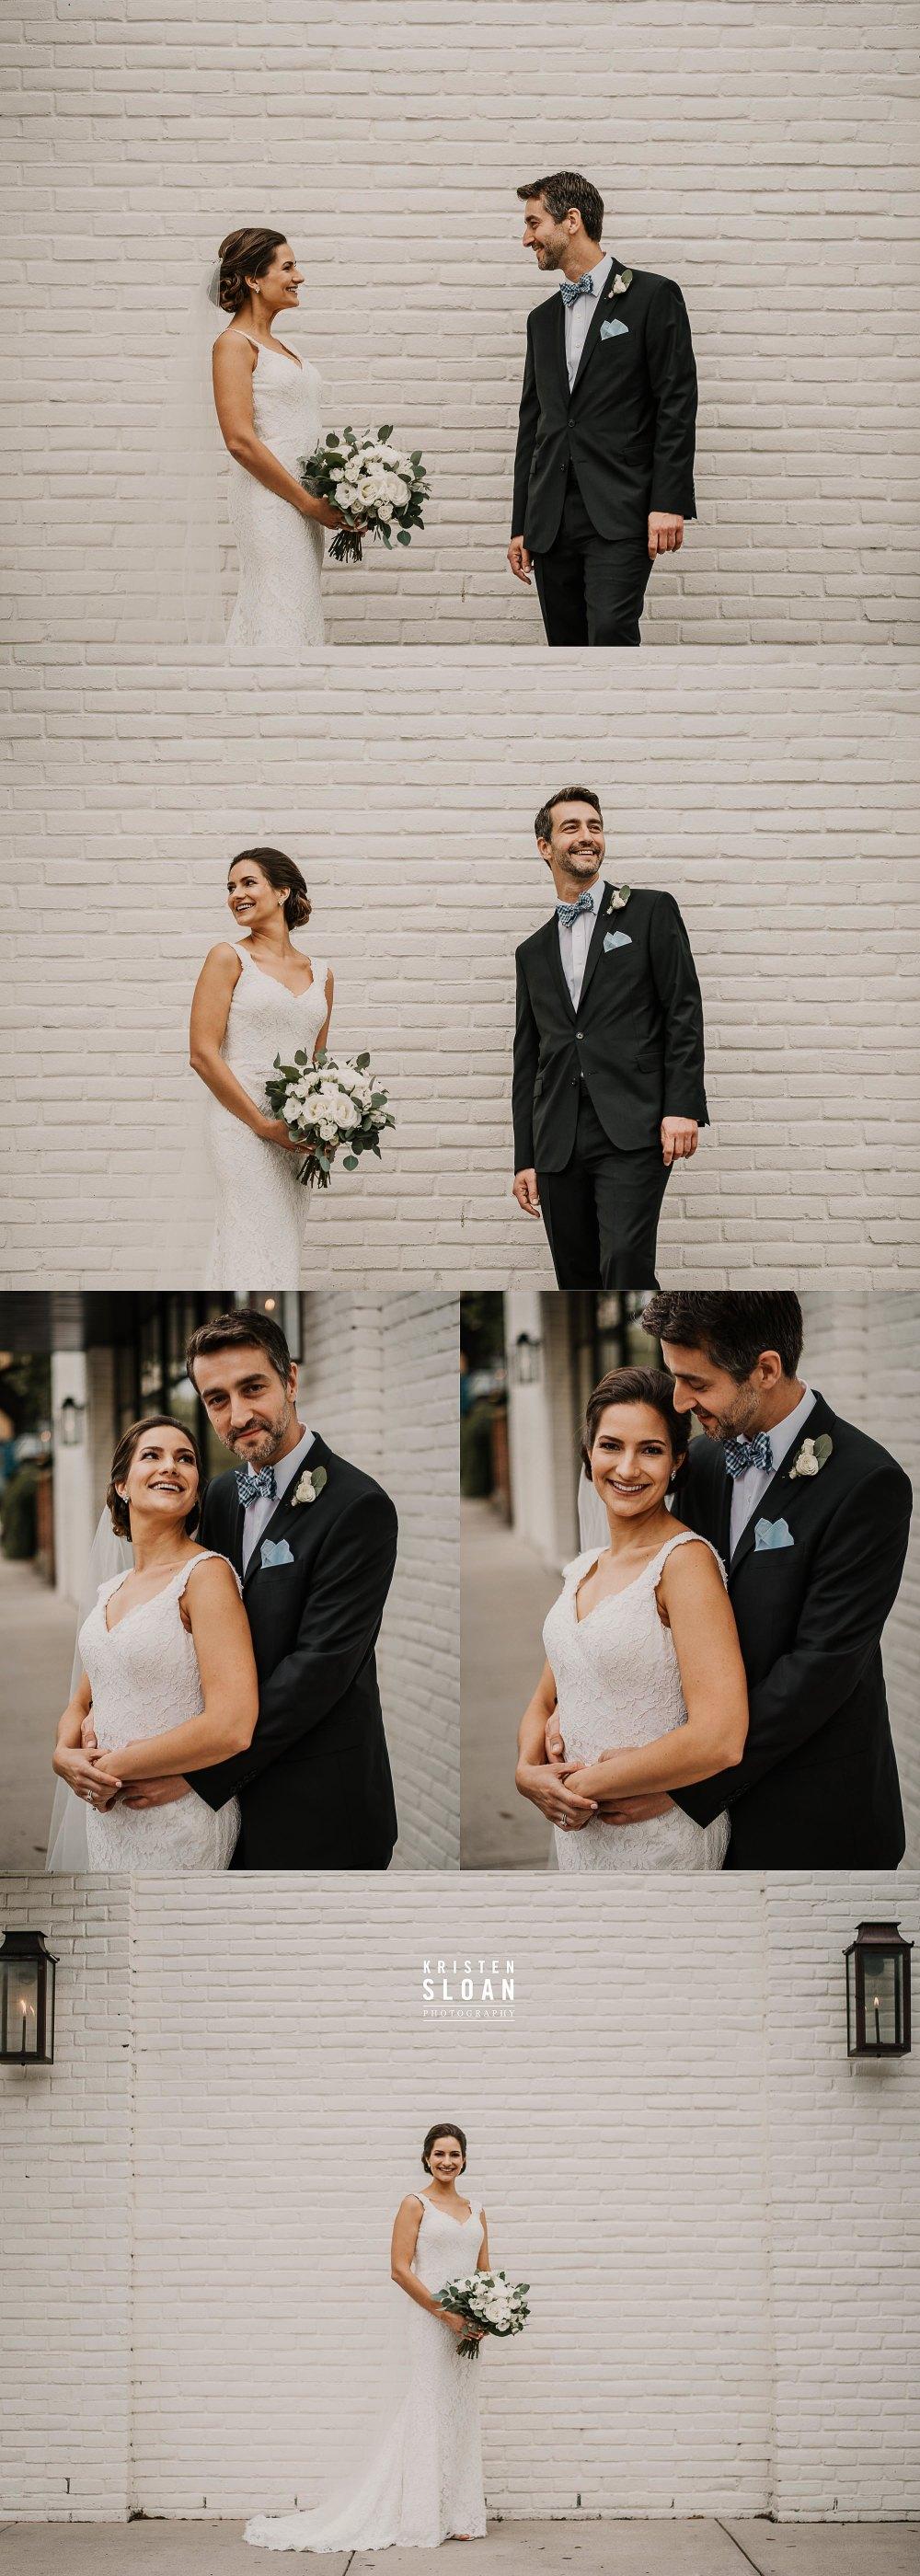 Oxford Exchange Tampa Wedding Bride Groom Portraits